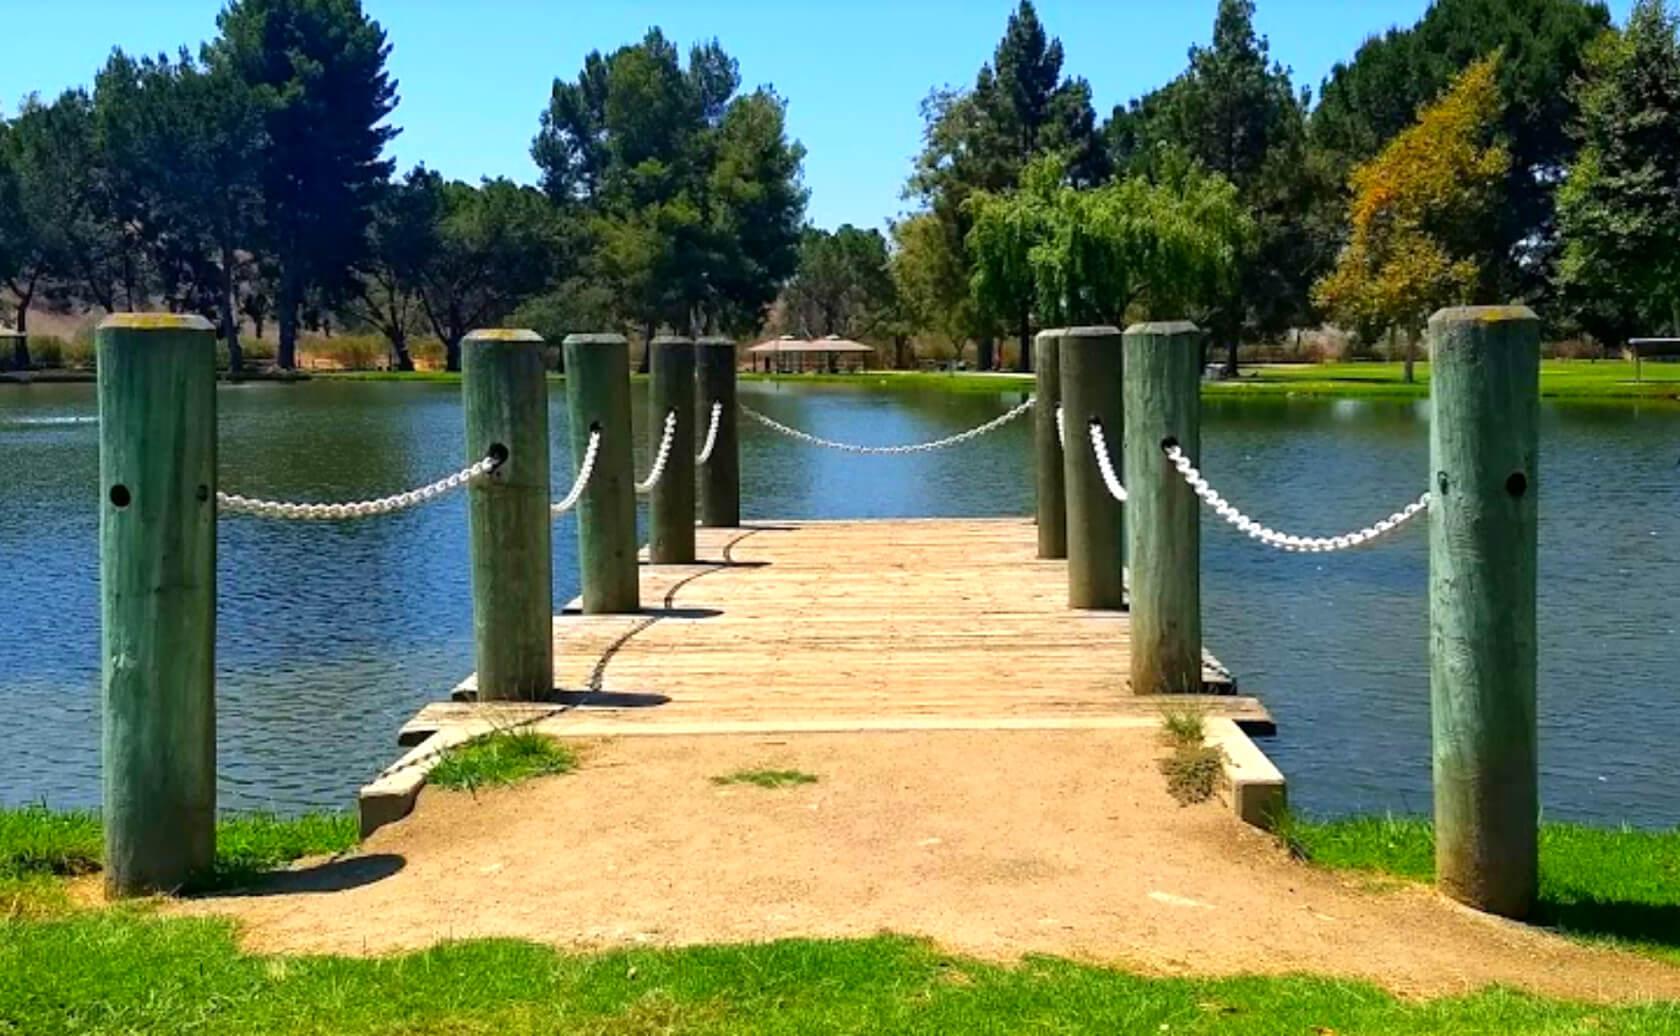 Carbon-Canyon-Park-Lake-Fishing-Guide-Report-Brea-CA-01